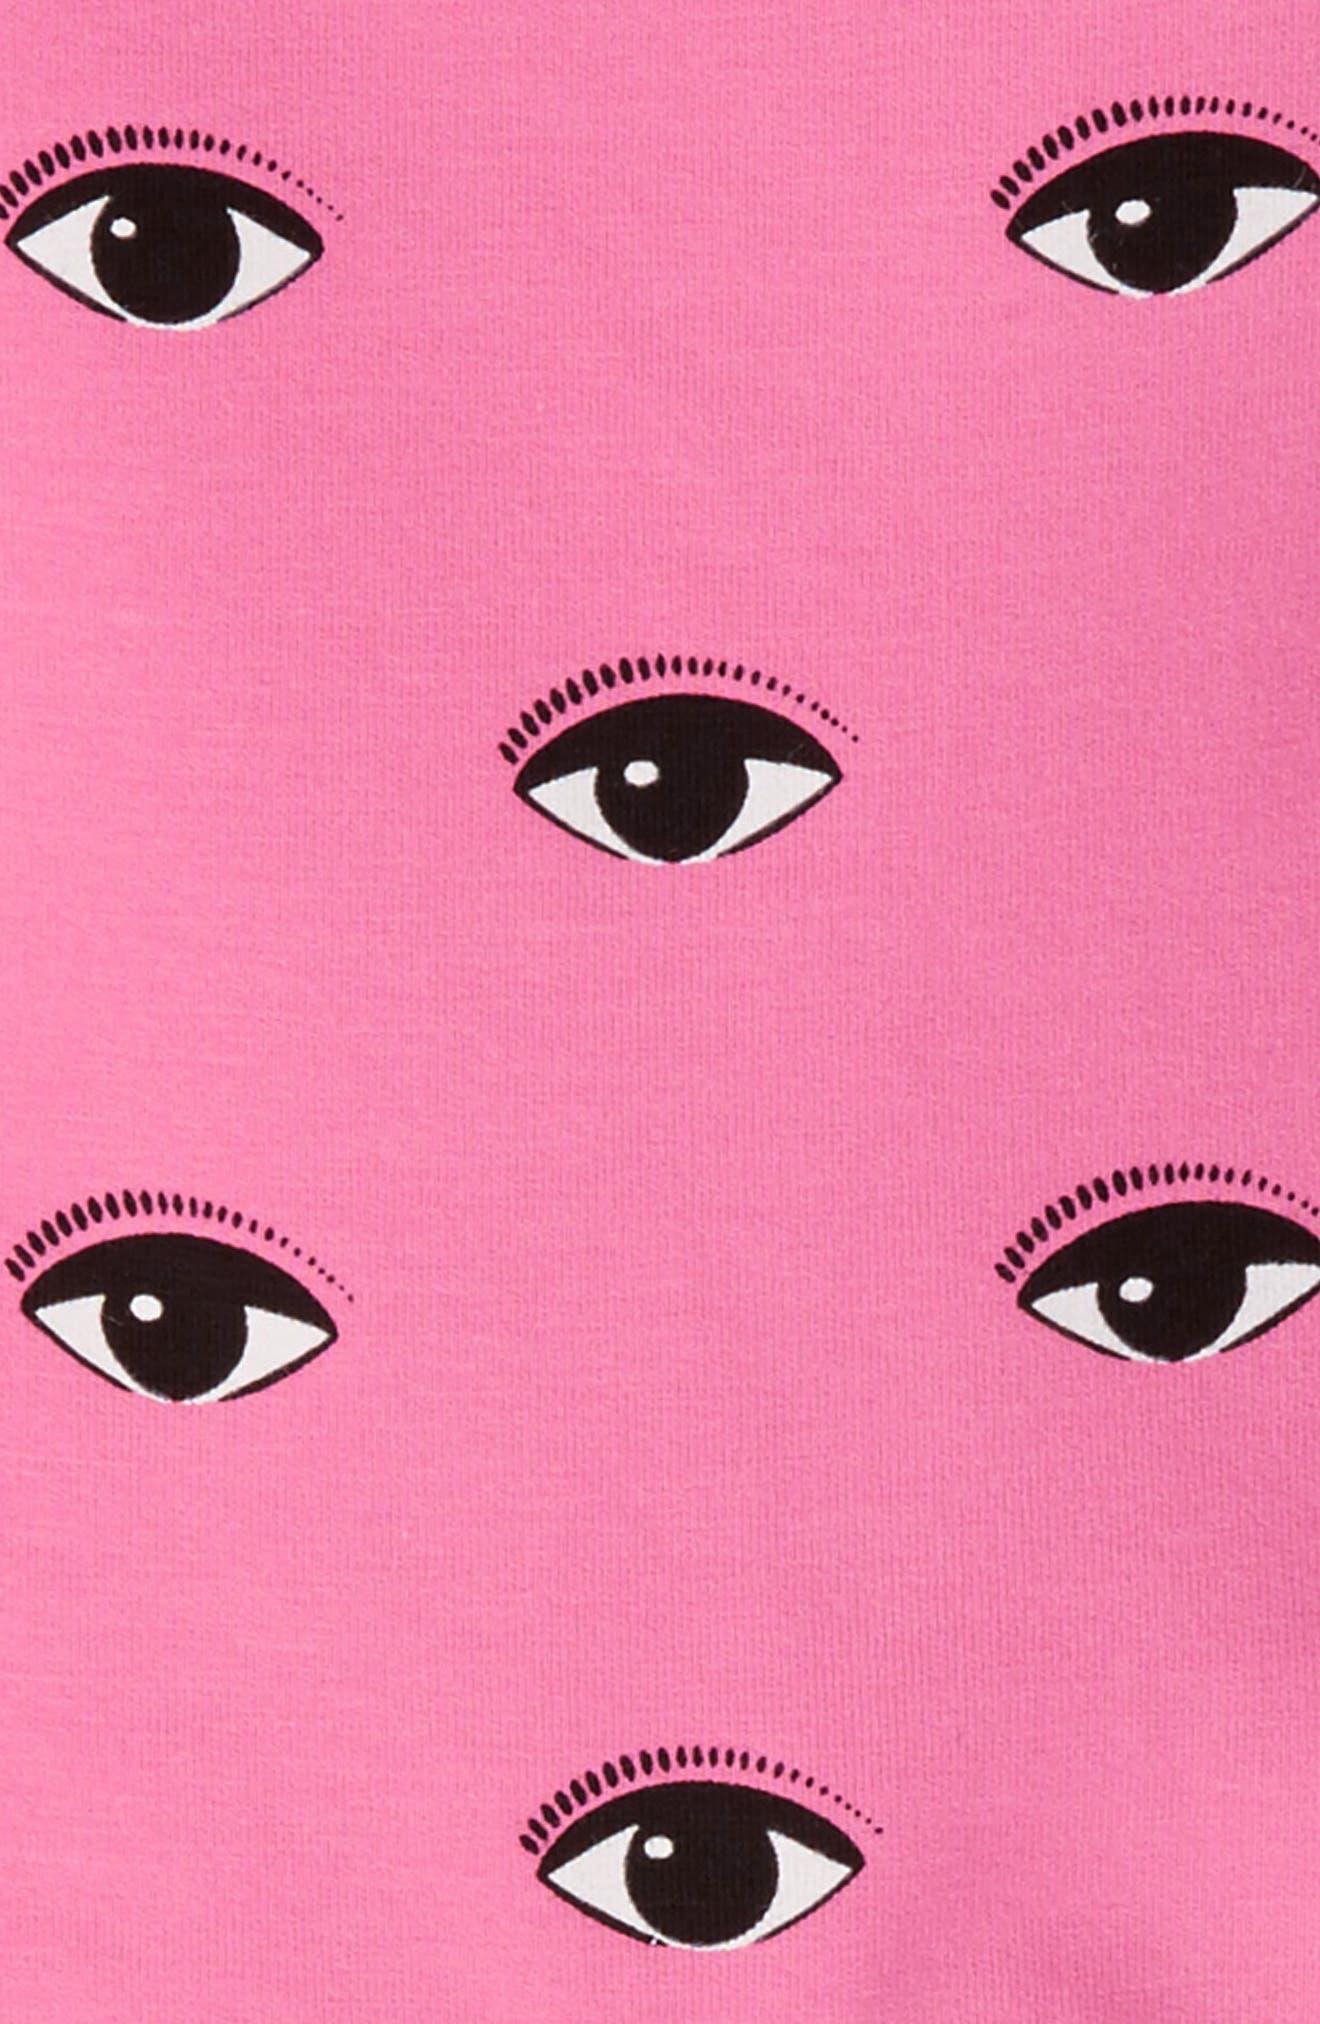 Eye Print Sweatshirt,                             Alternate thumbnail 2, color,                             664